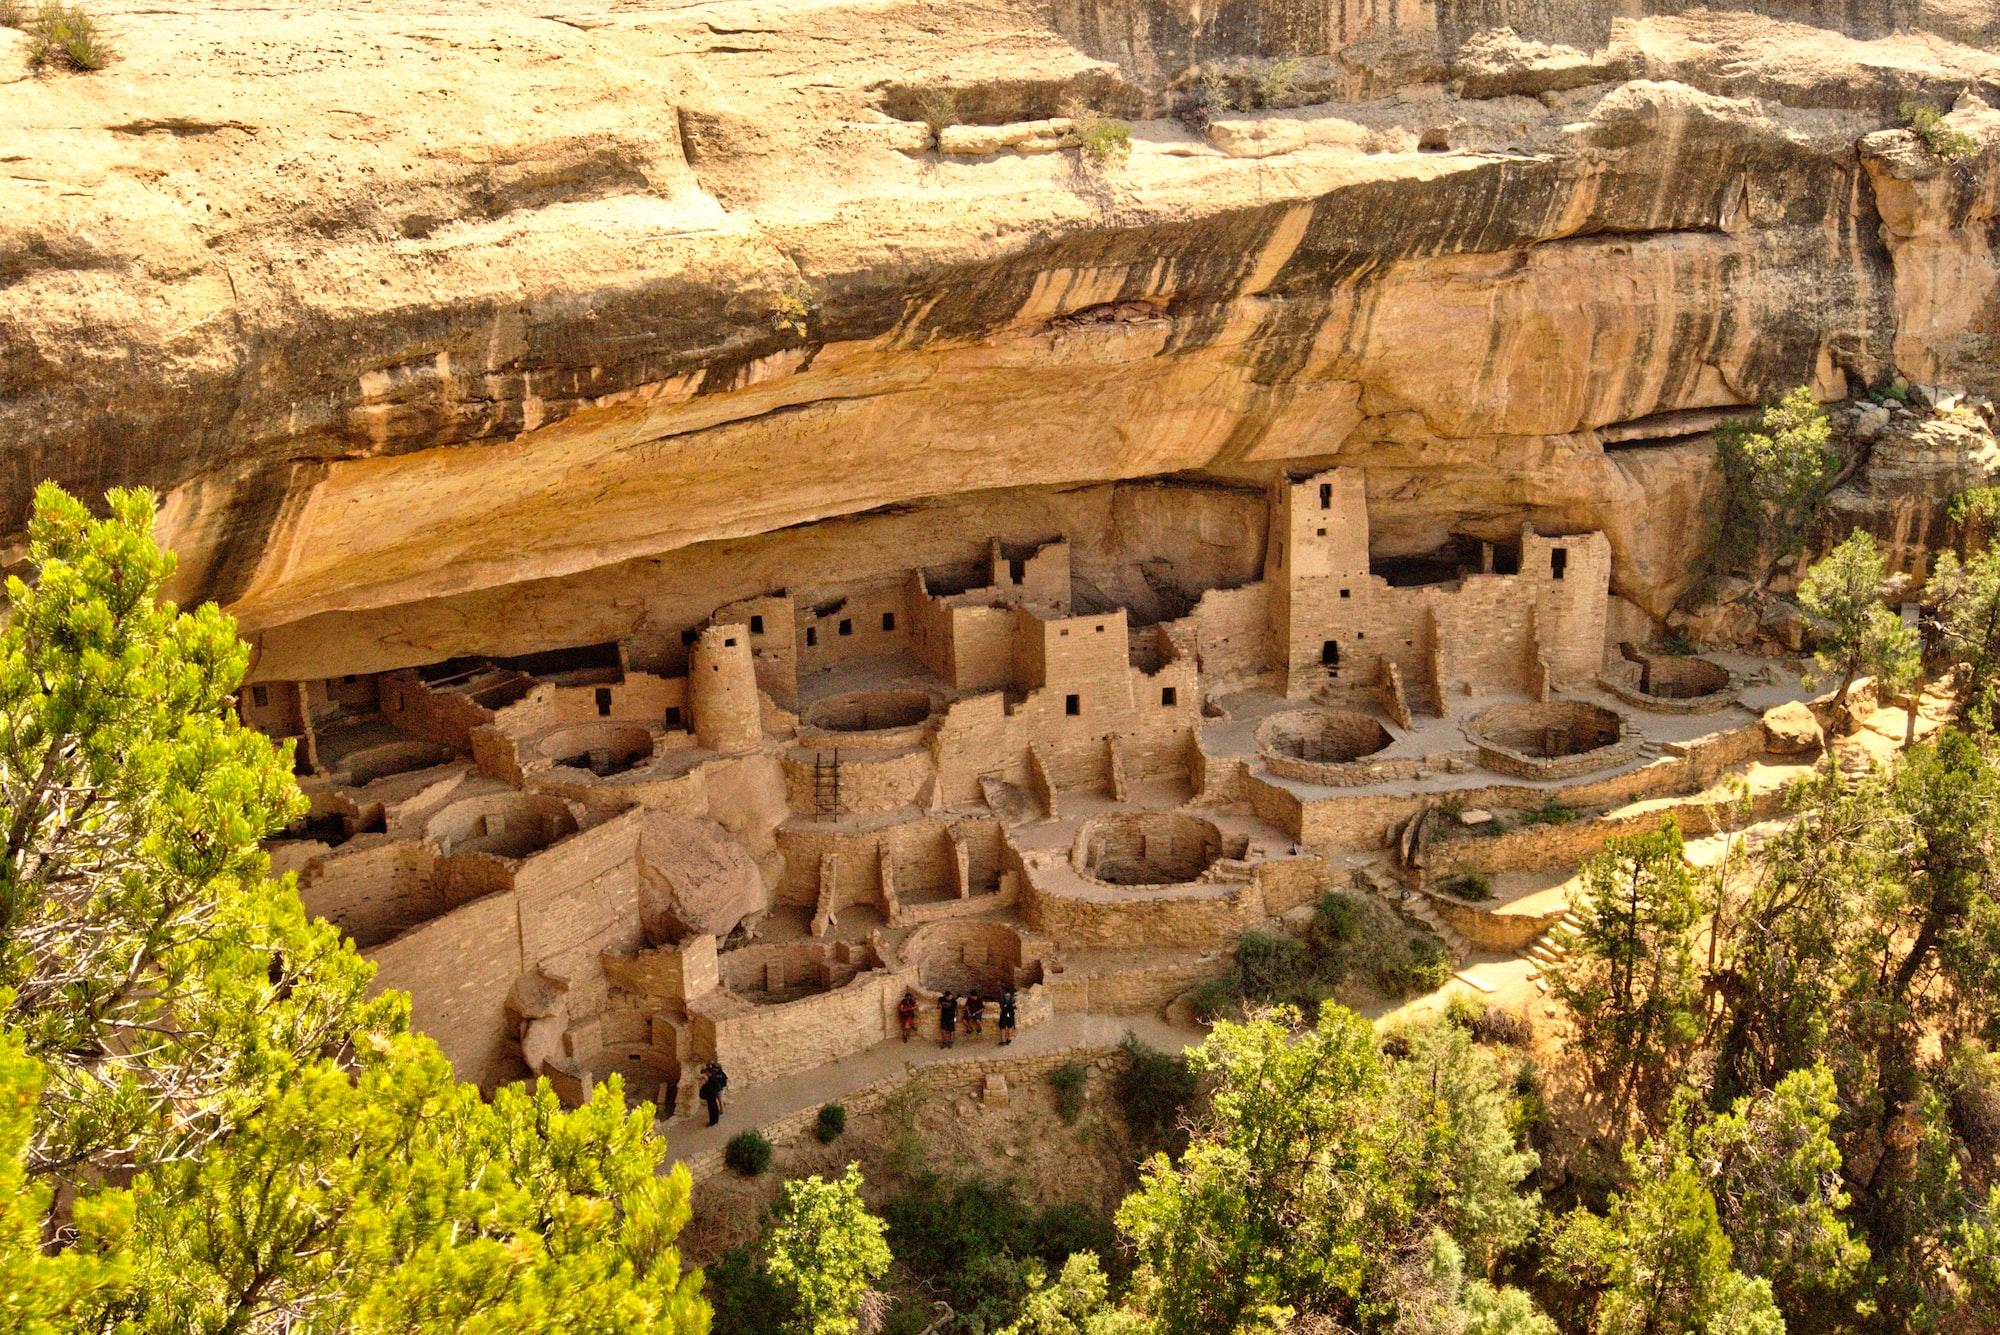 Fabulous Cliff Dwellings at Mesa Verde